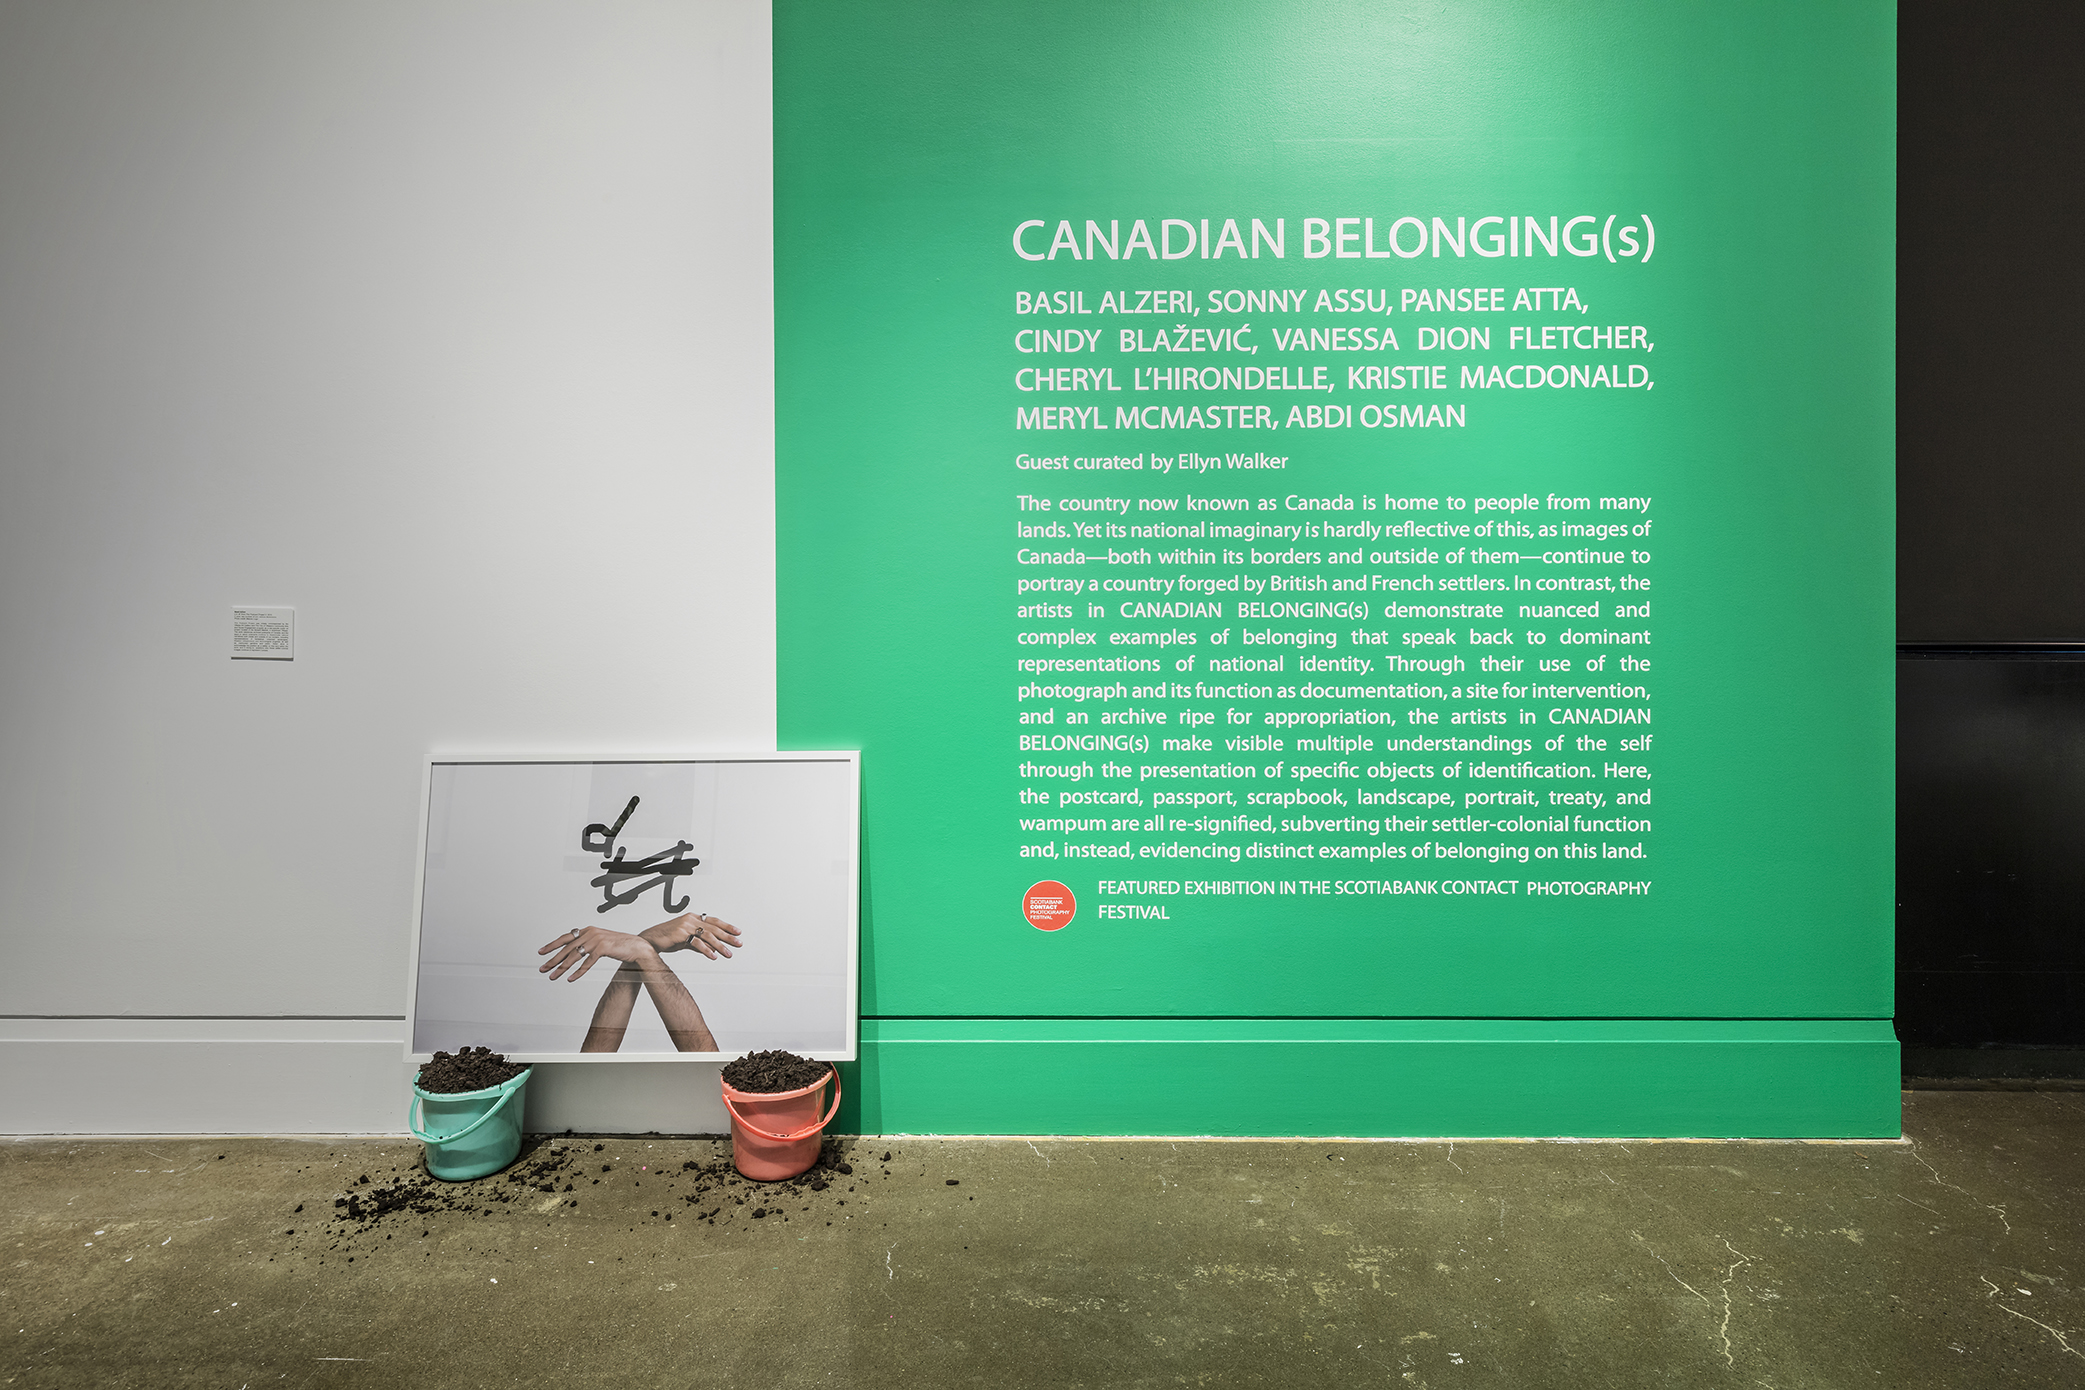 Canadian Belonging(s) , Robert Freeman Gallery, Art Gallery of Mississauga. Photo by Toni Hafkenscheid.